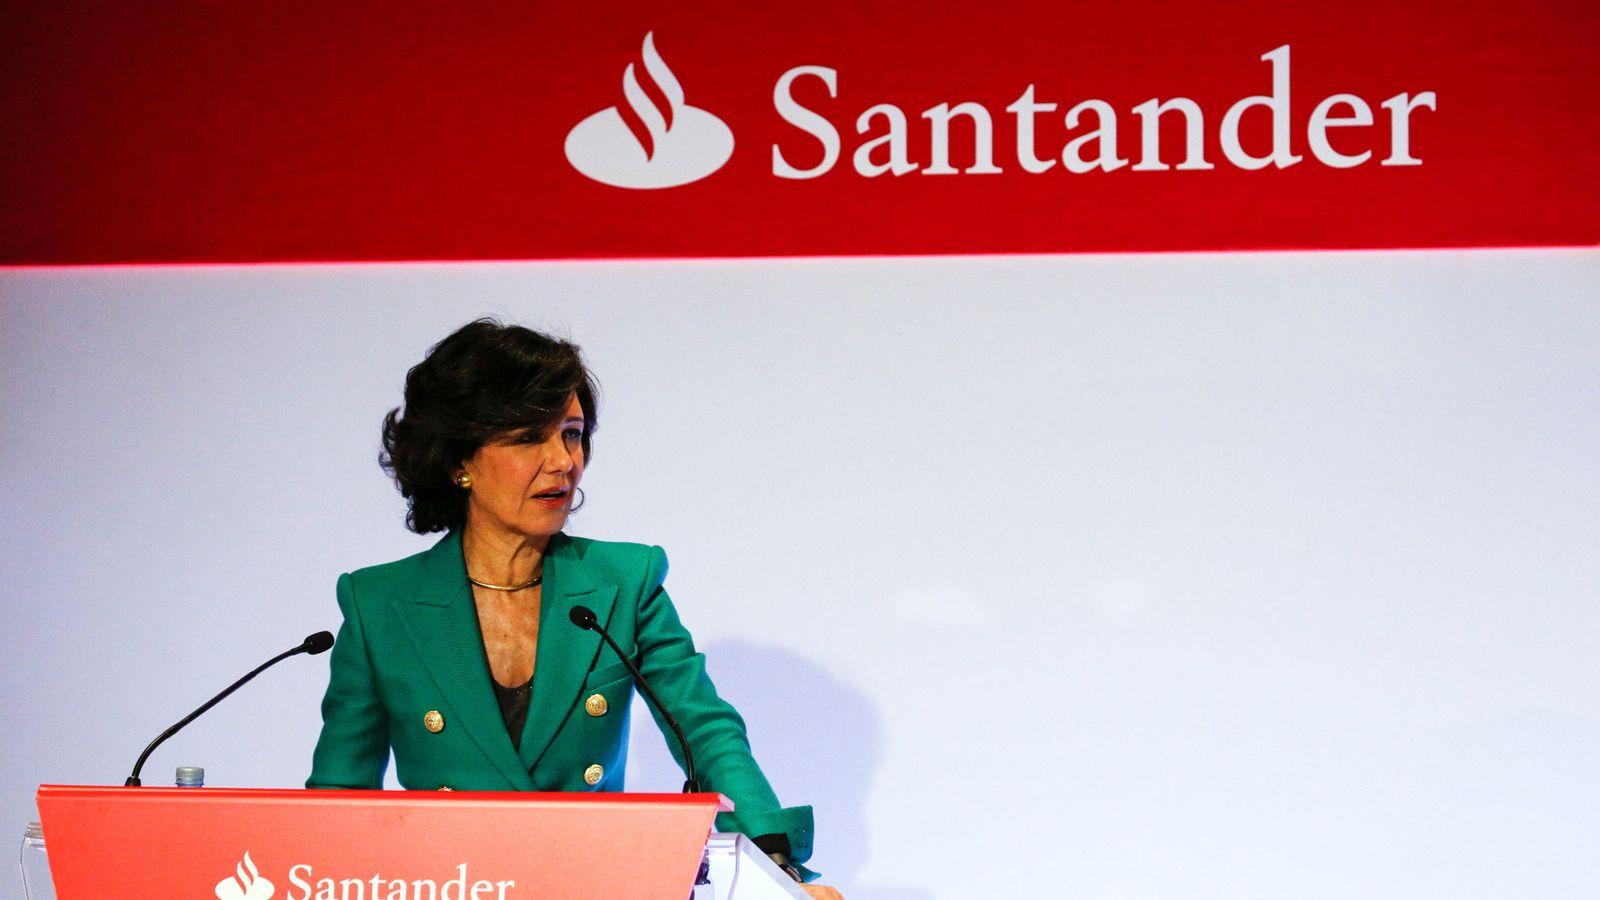 J Banco Santander Prestamos Autonomos 2017 Furlemantsond